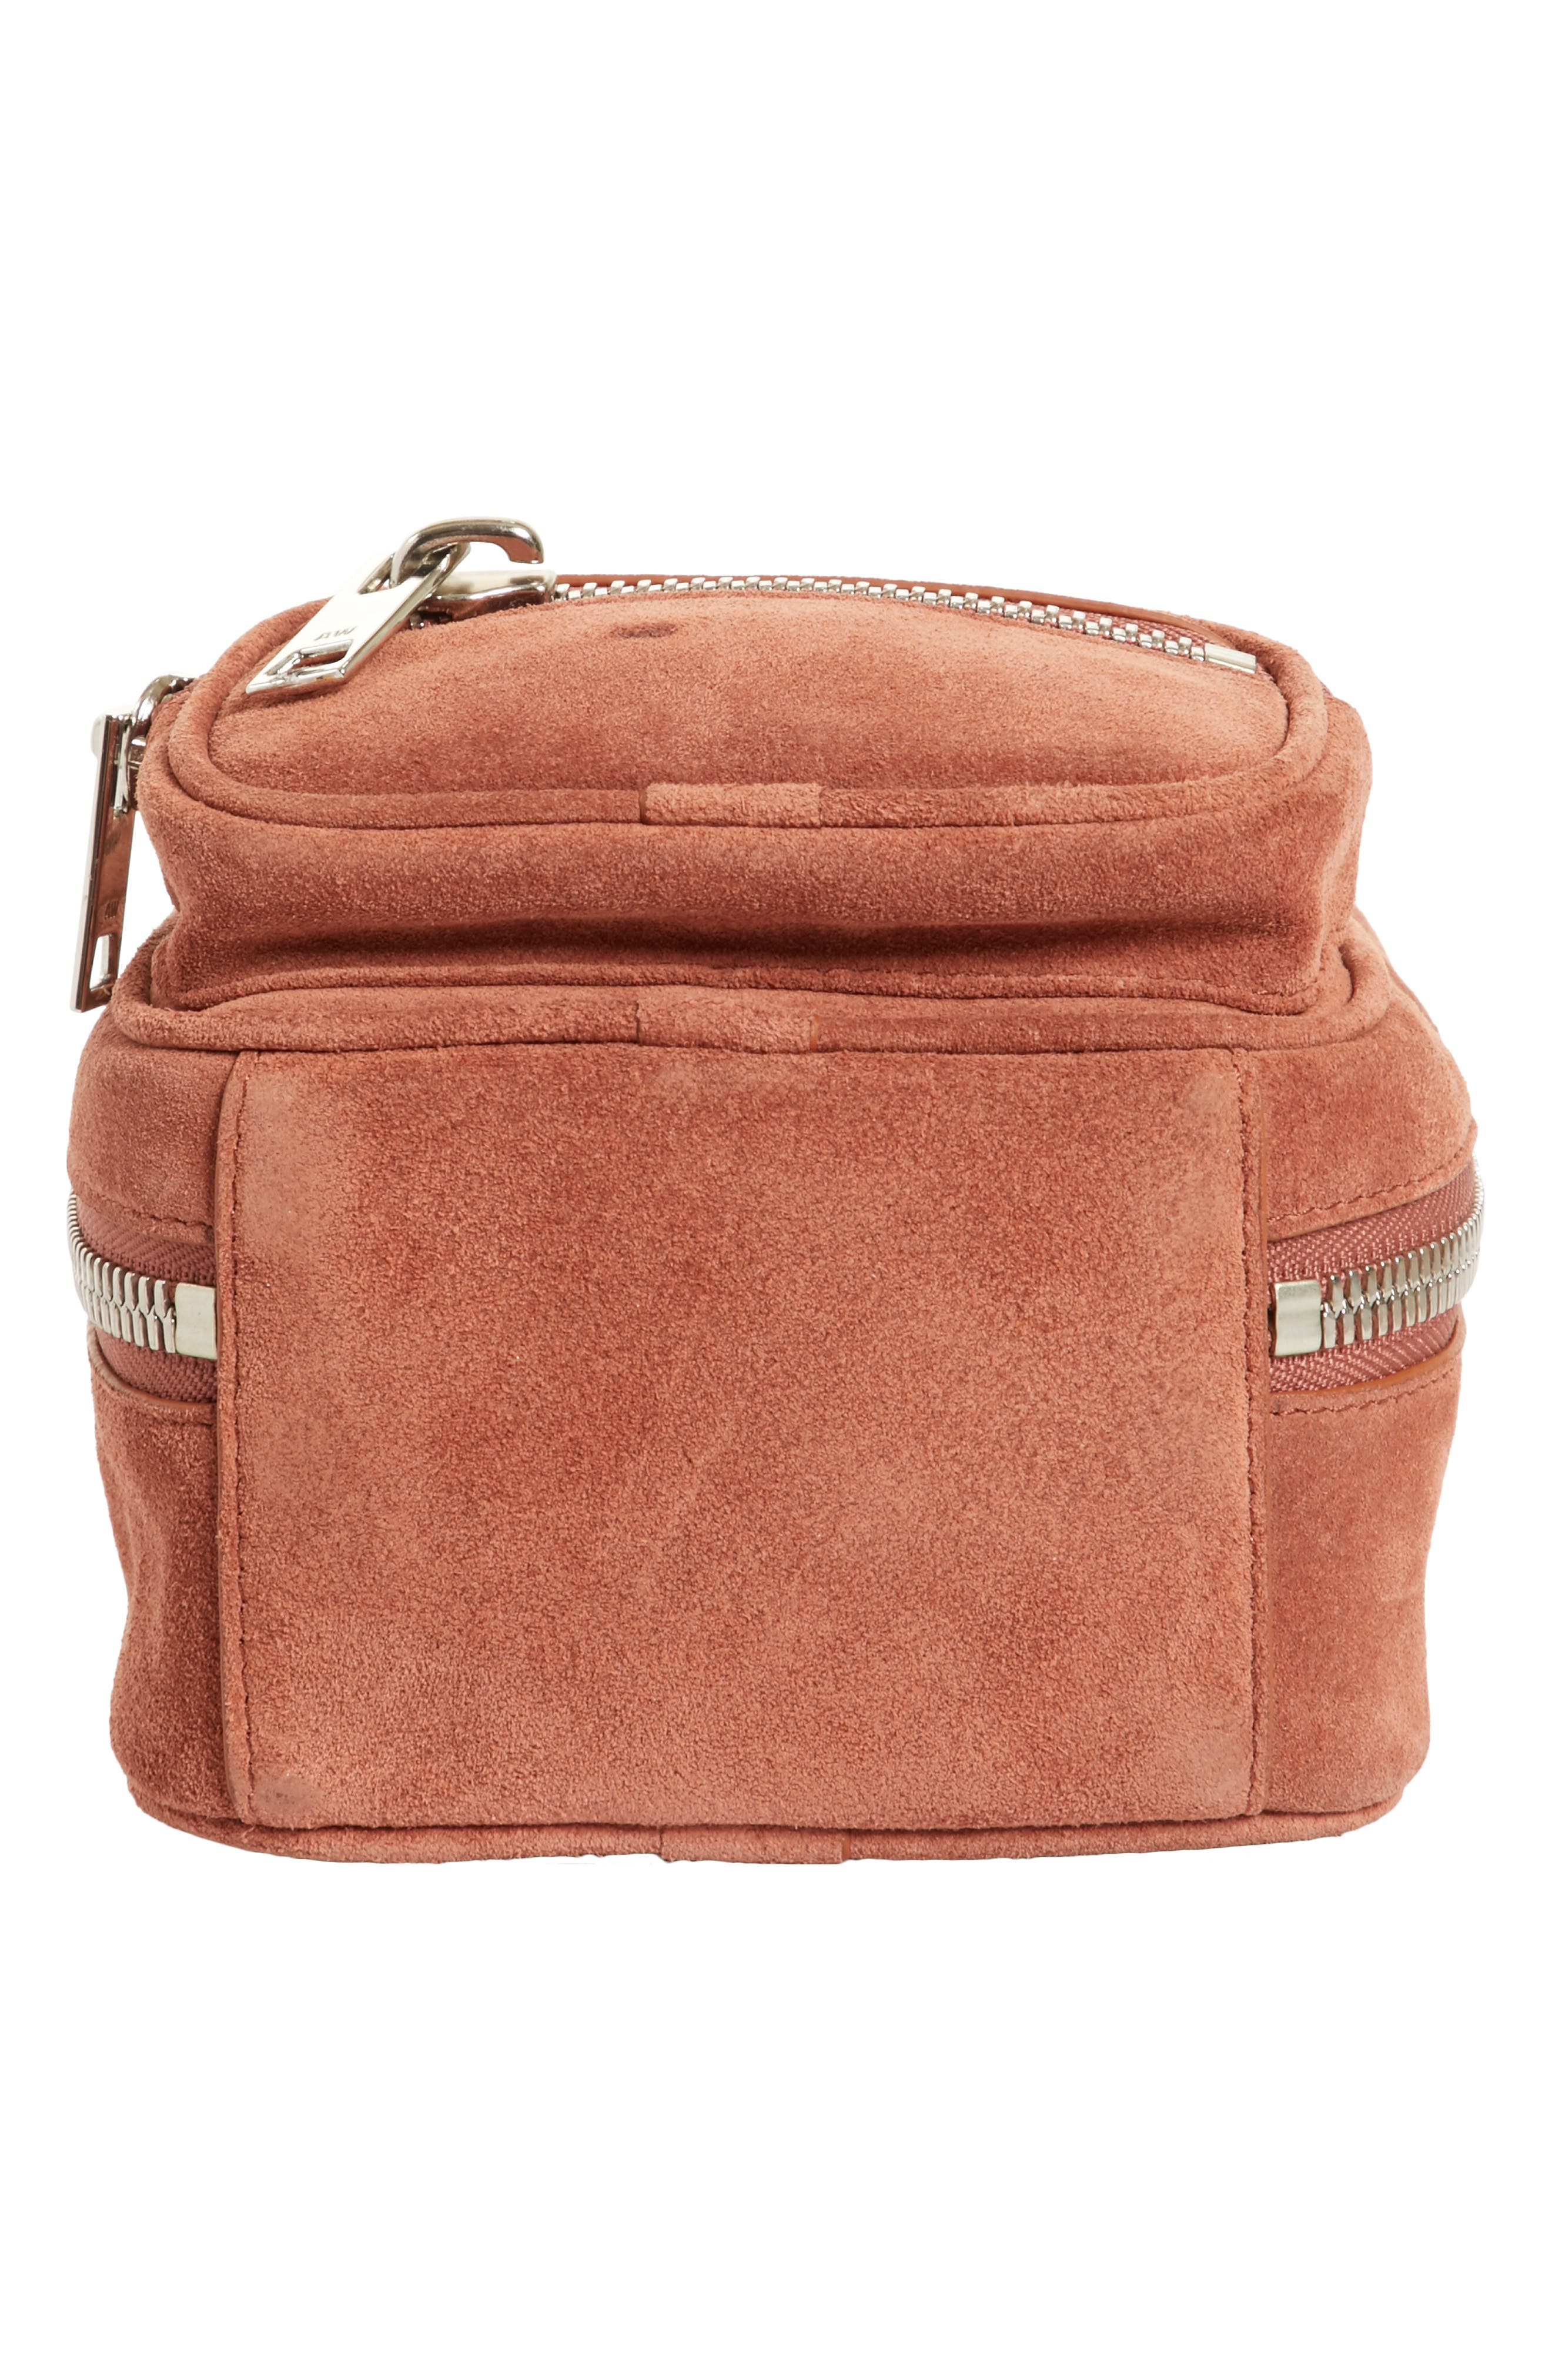 Mini Attica Suede Backpack-Shaped Crossbody Bag,                             Alternate thumbnail 6, color,                             200